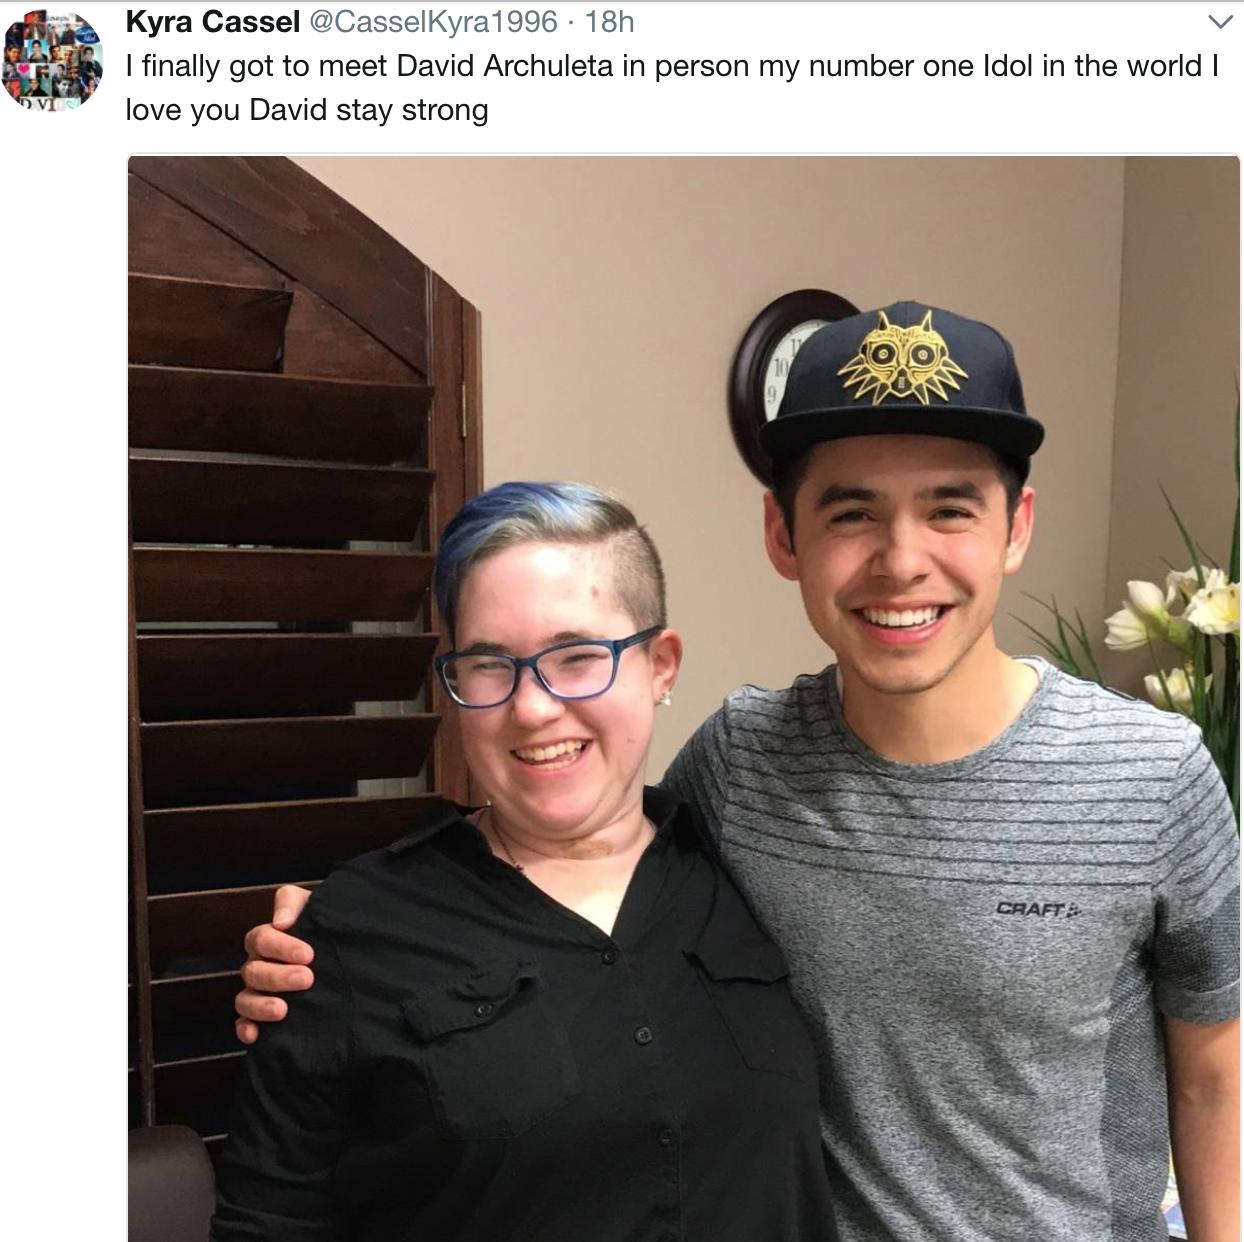 Kyra Cassel meets David Archuleta